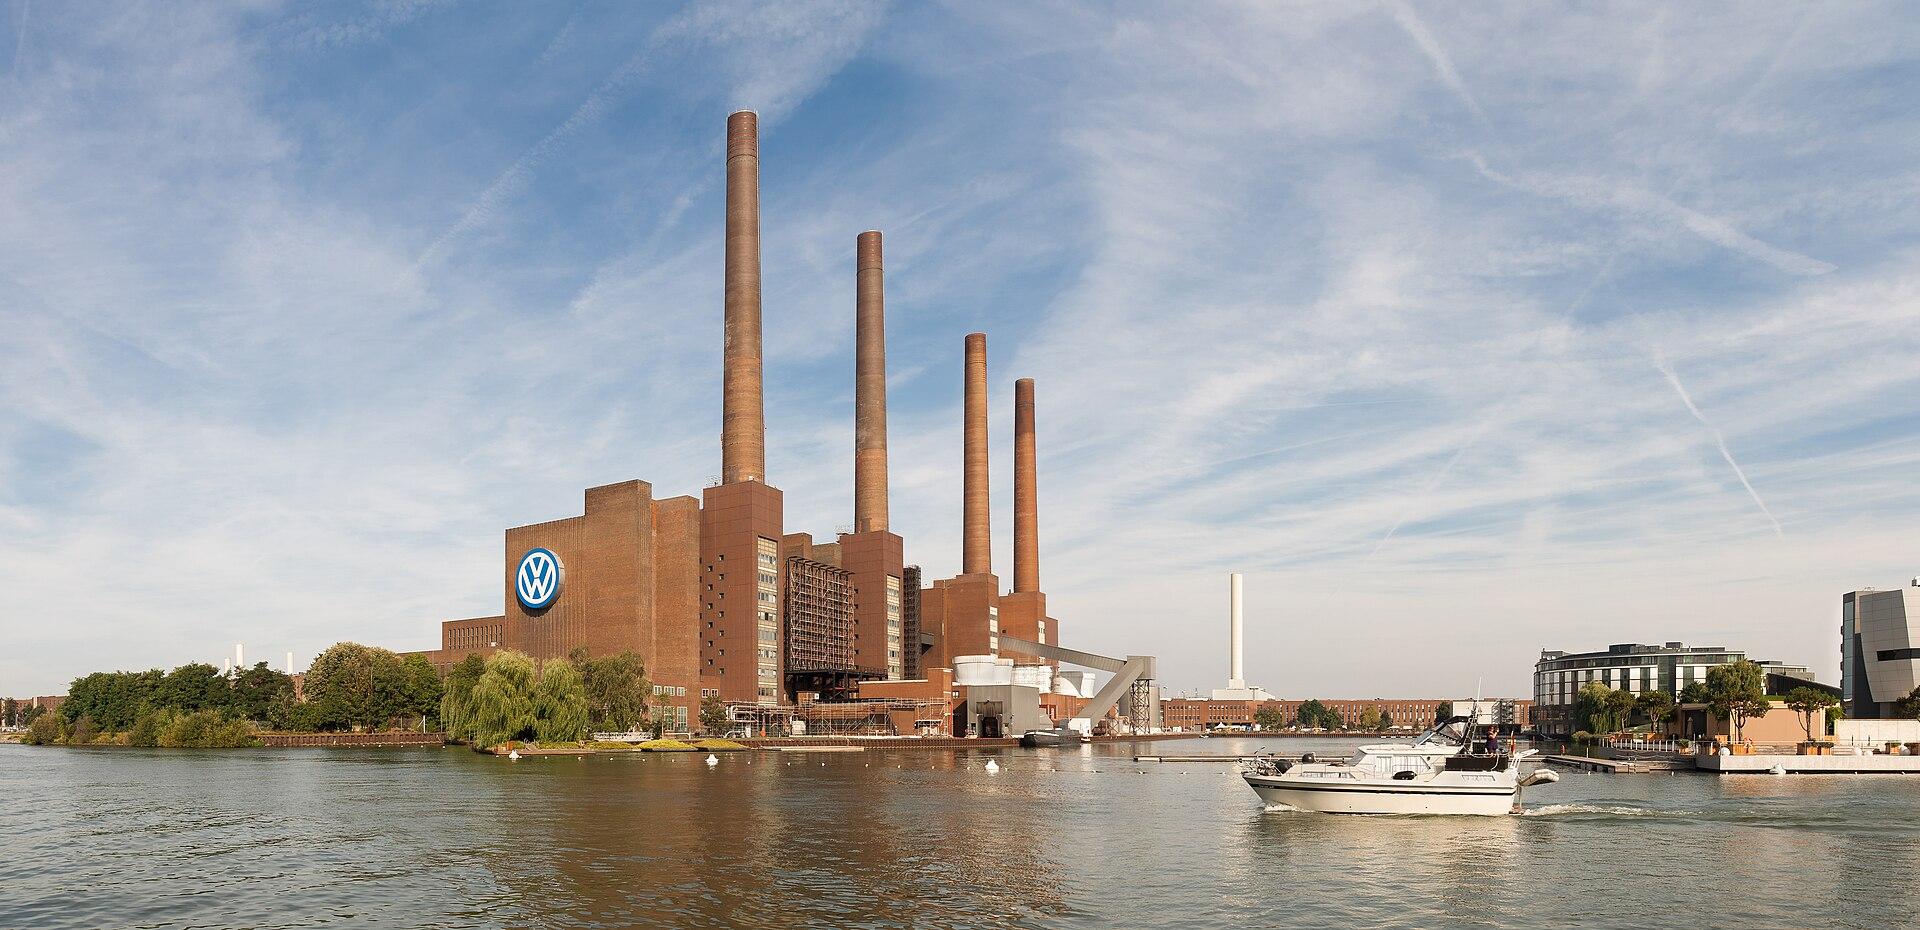 Wolfsburg Wikipedia